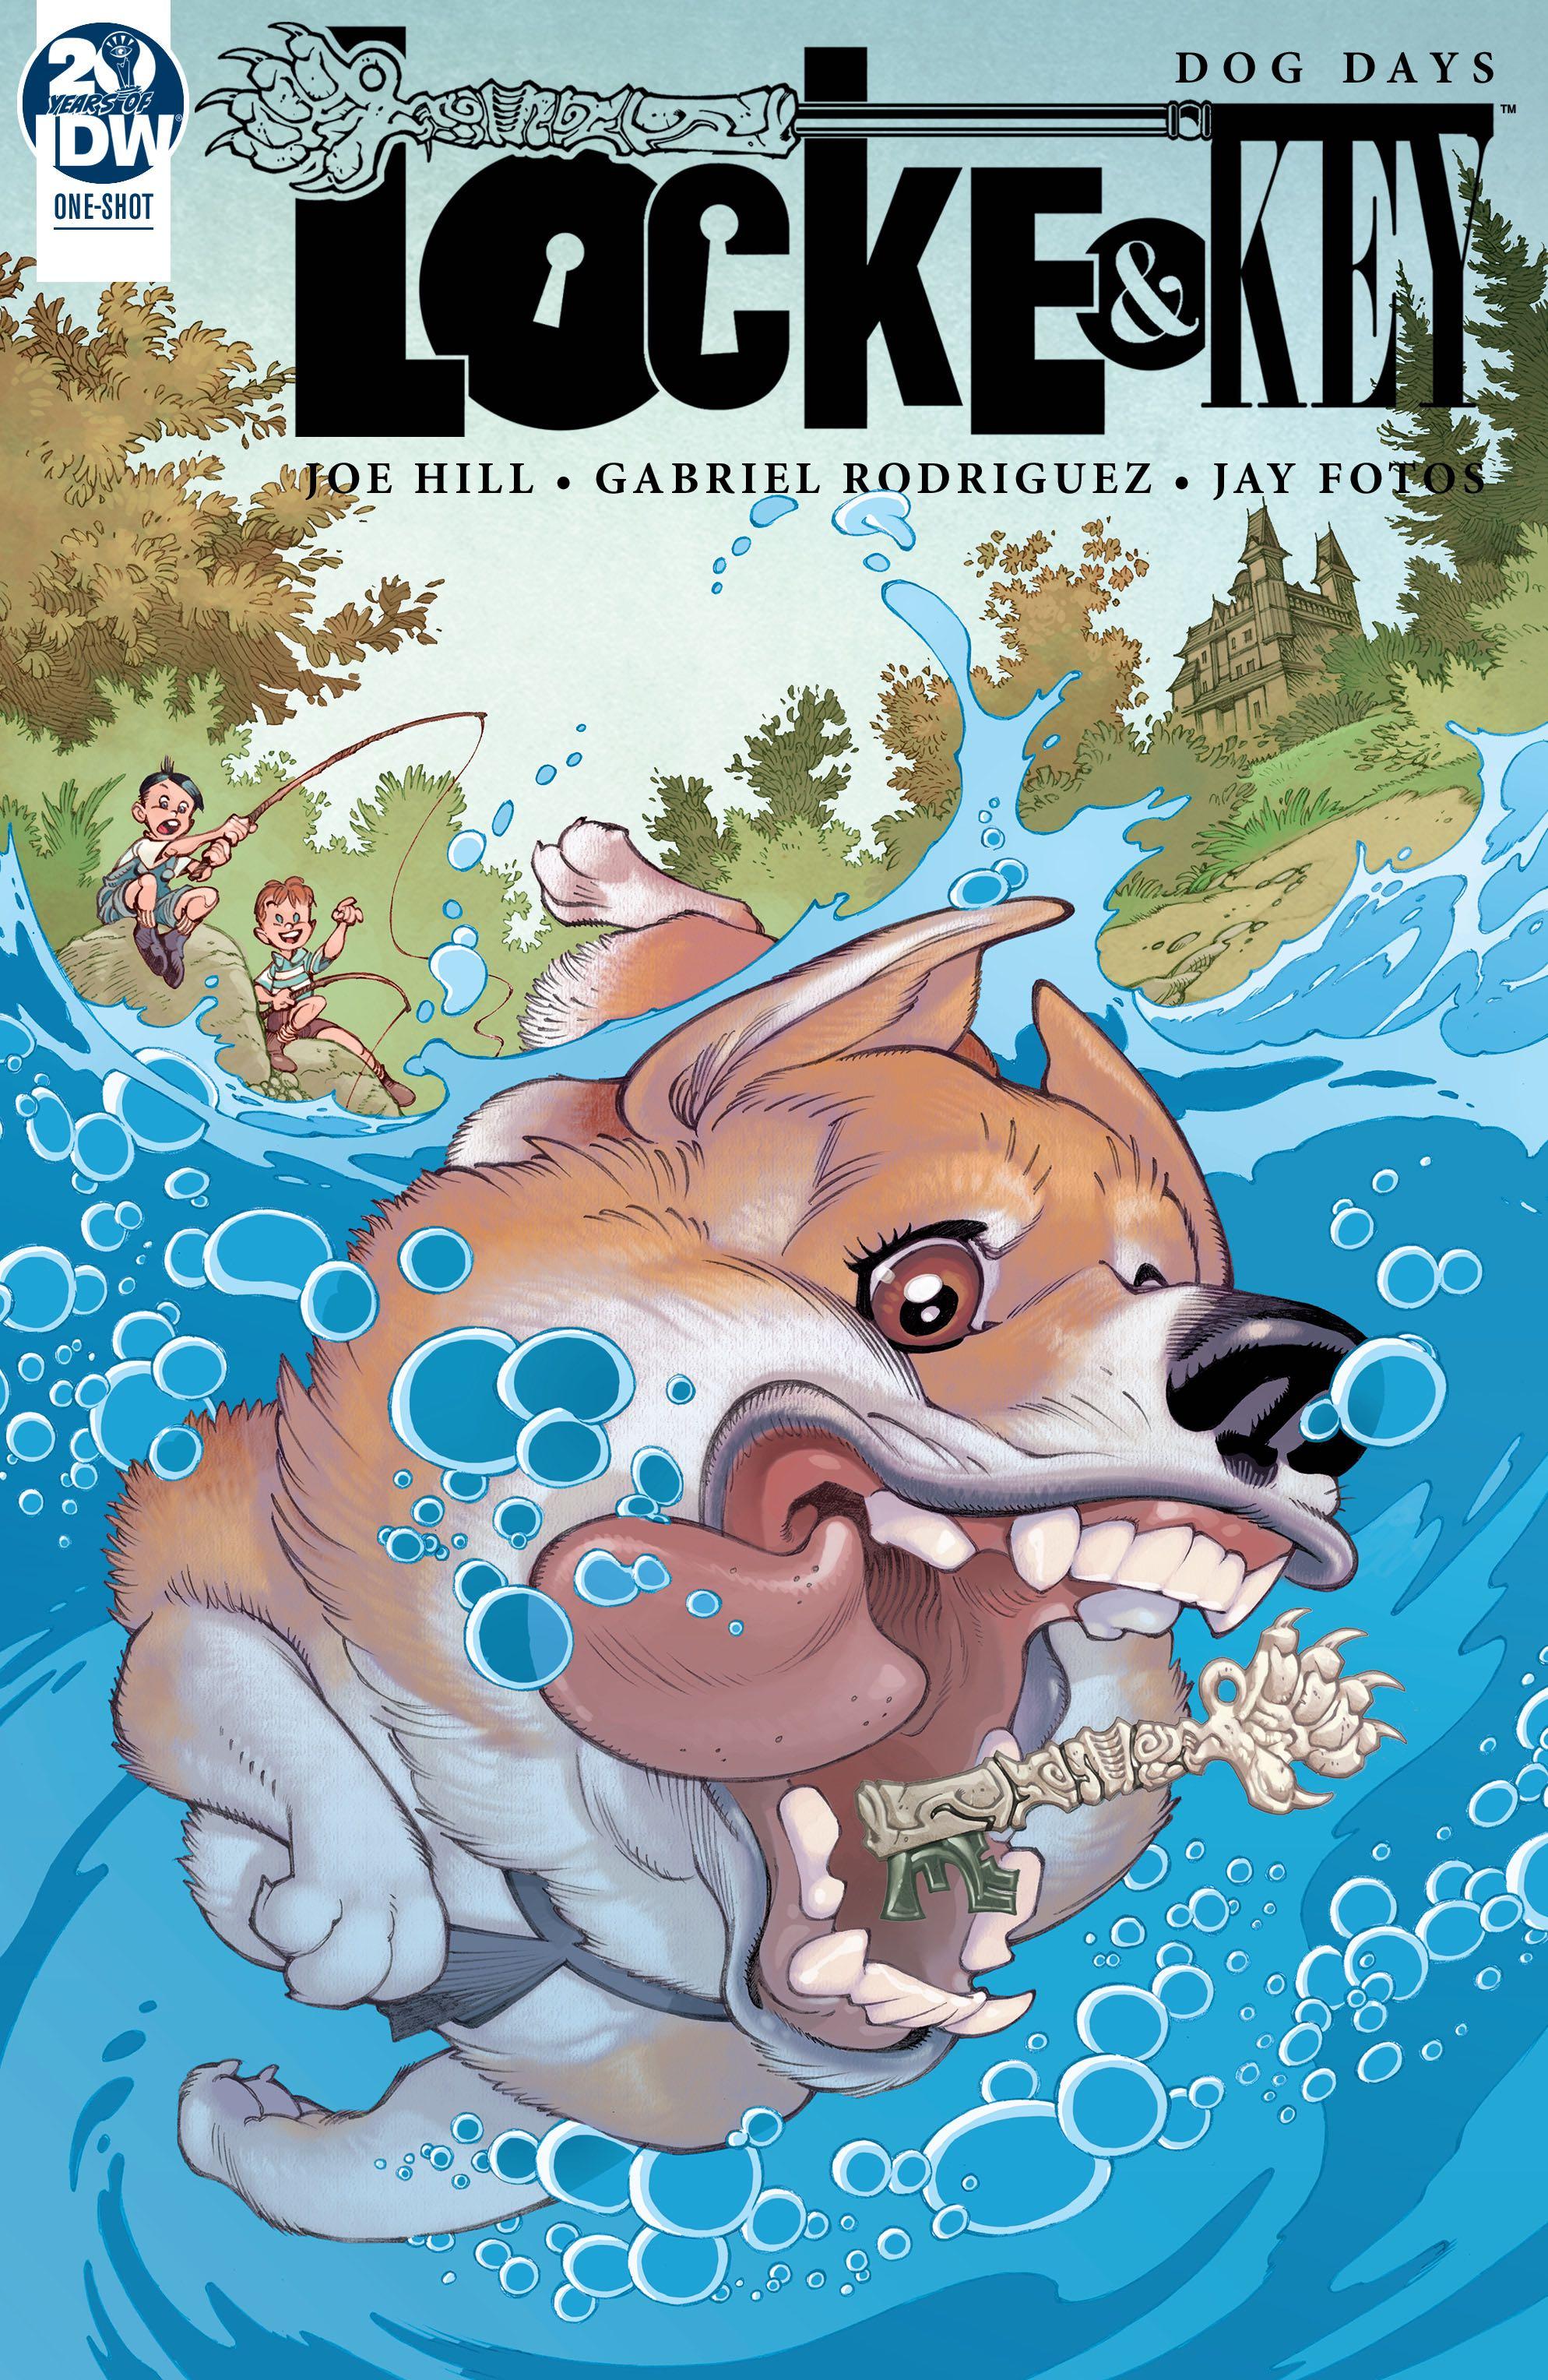 Locke & Key: Dog Days, IDW